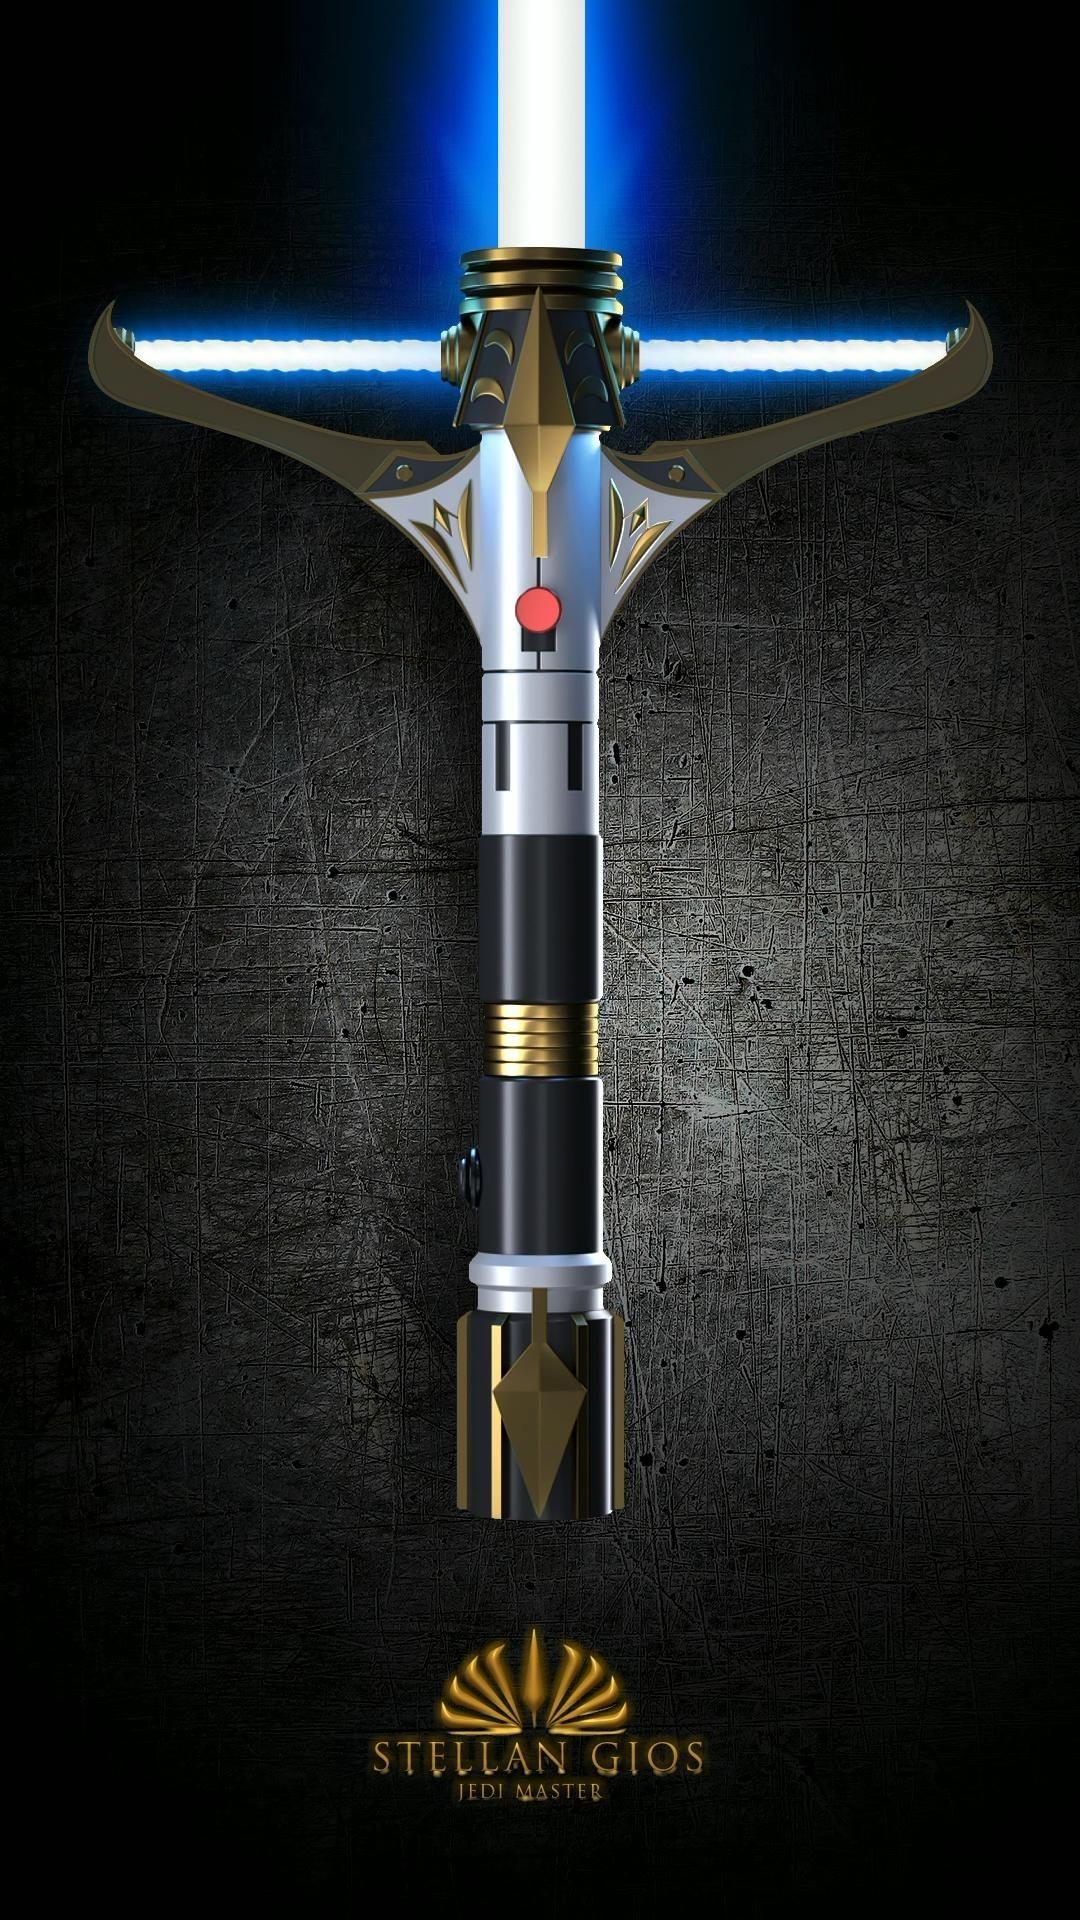 Stellan Gios's Lightsaber (The High Republic)